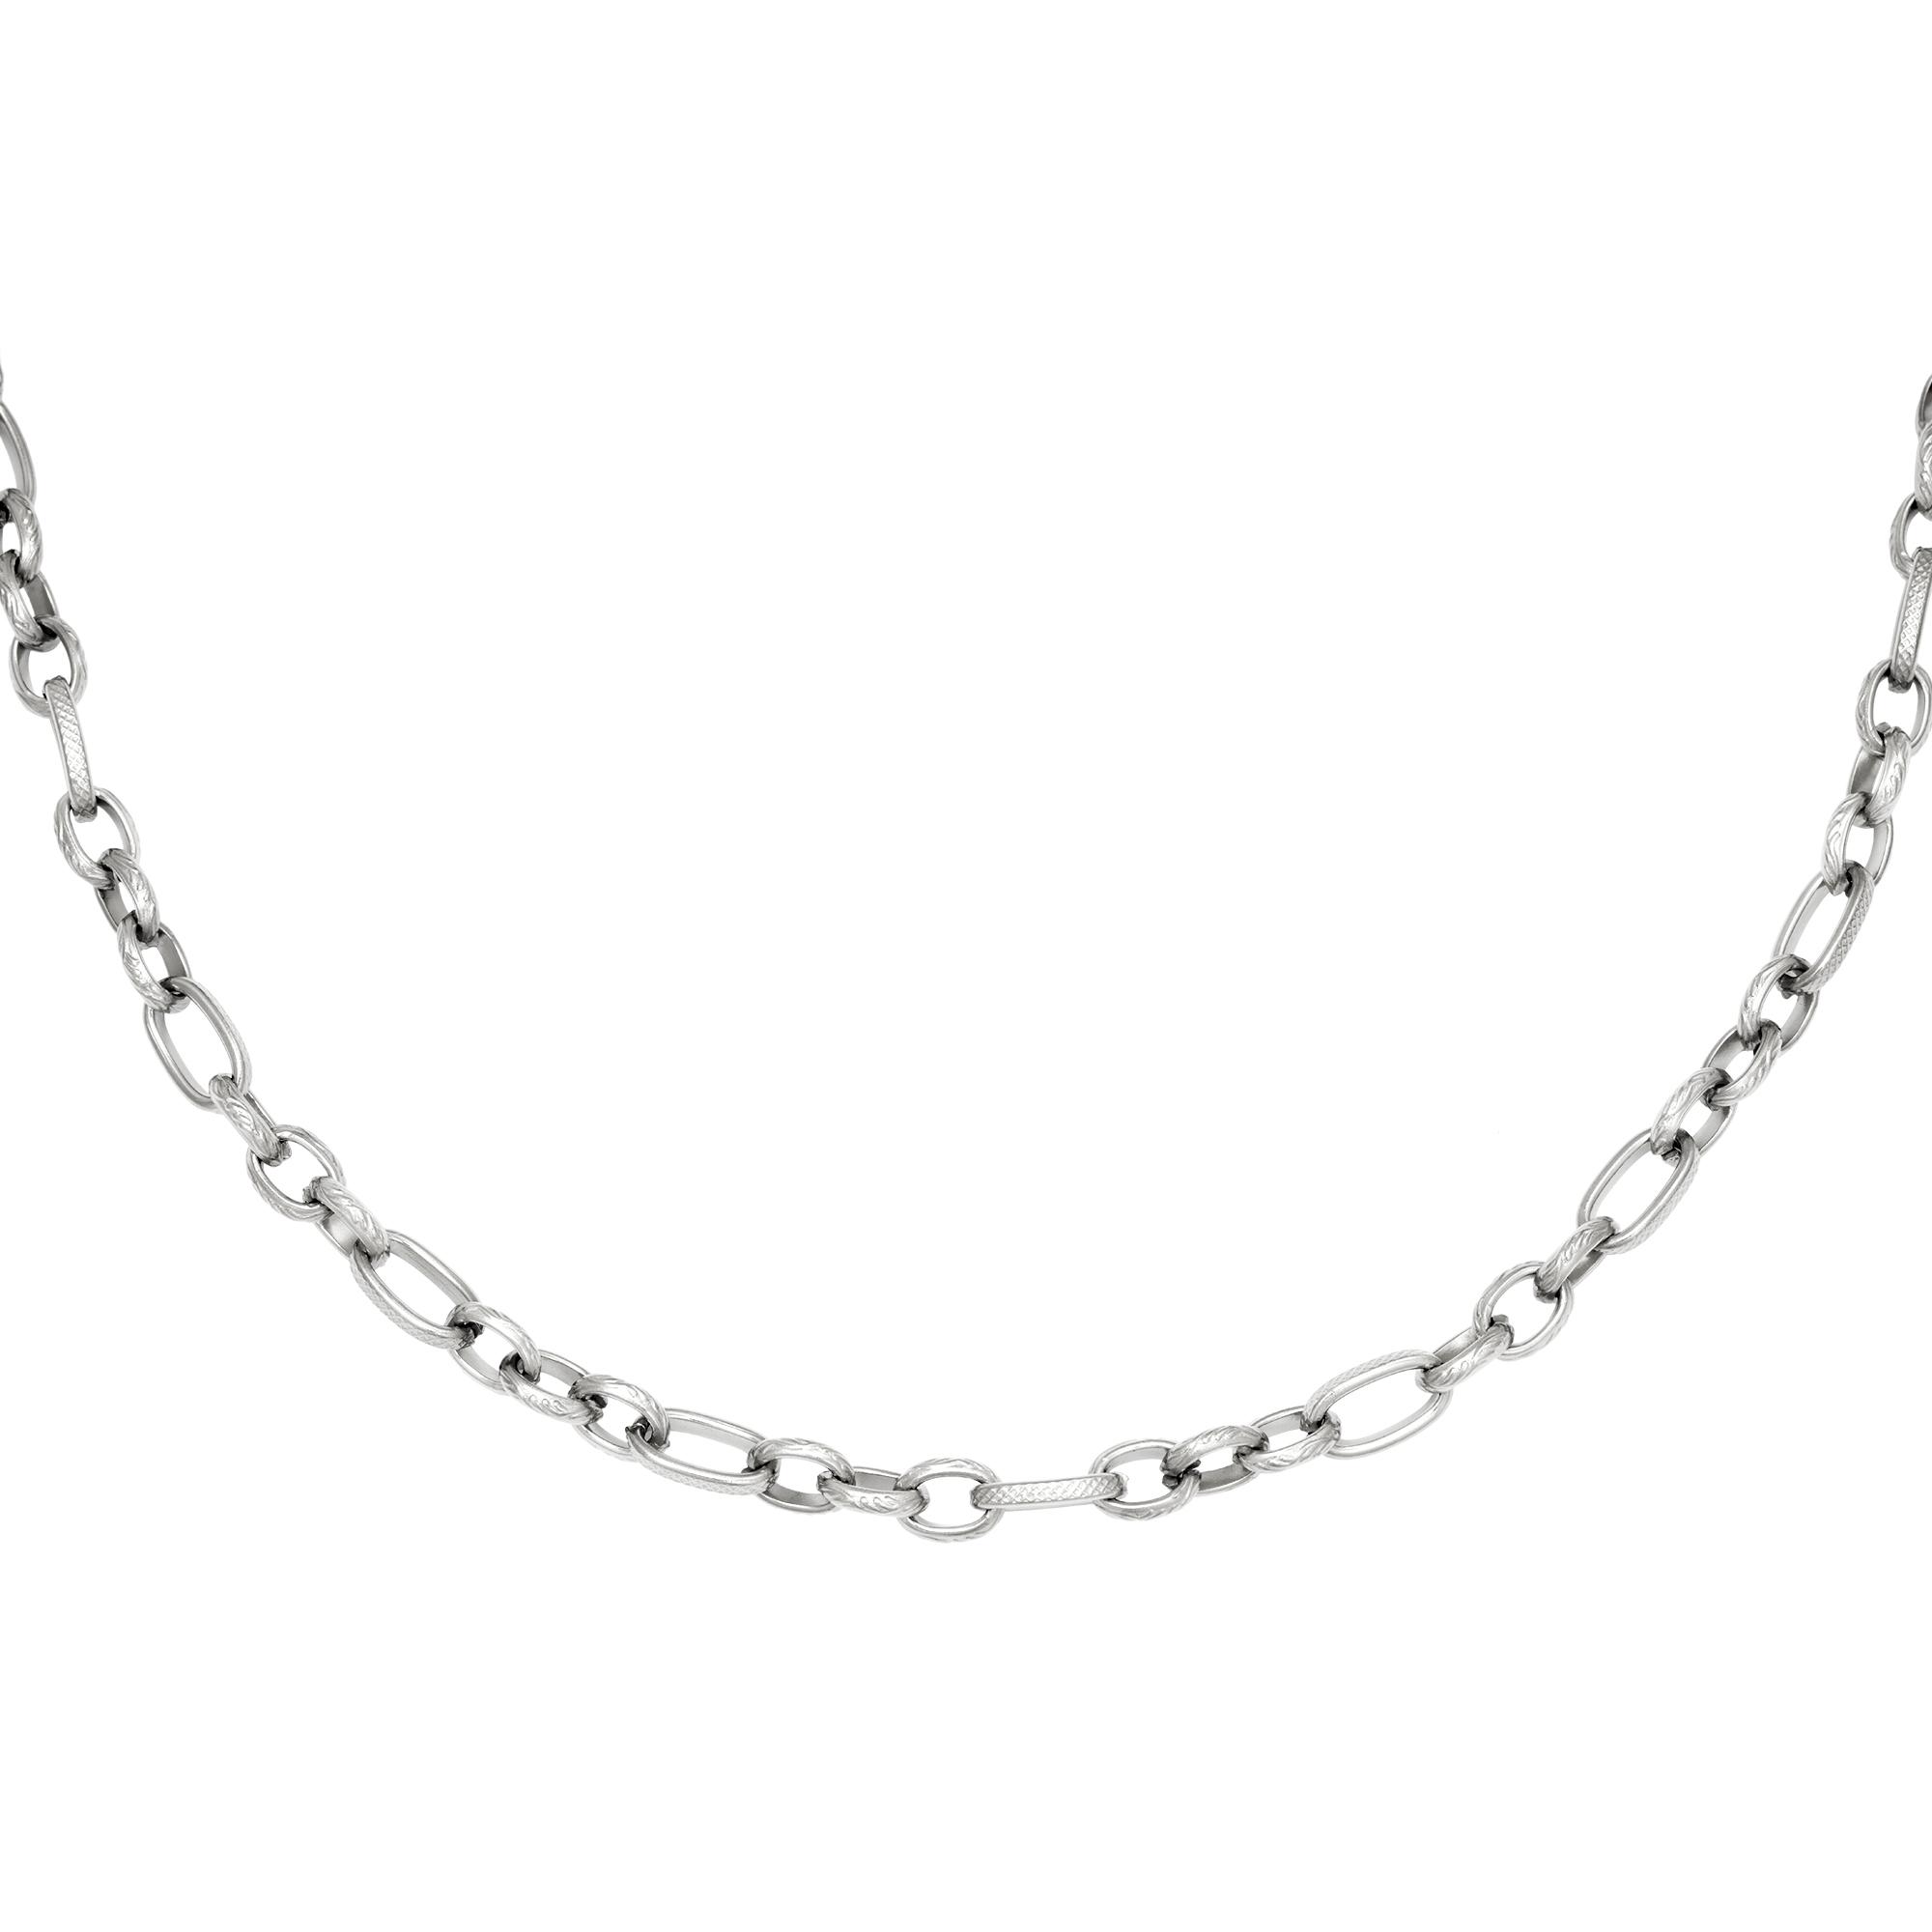 Halskette interlink